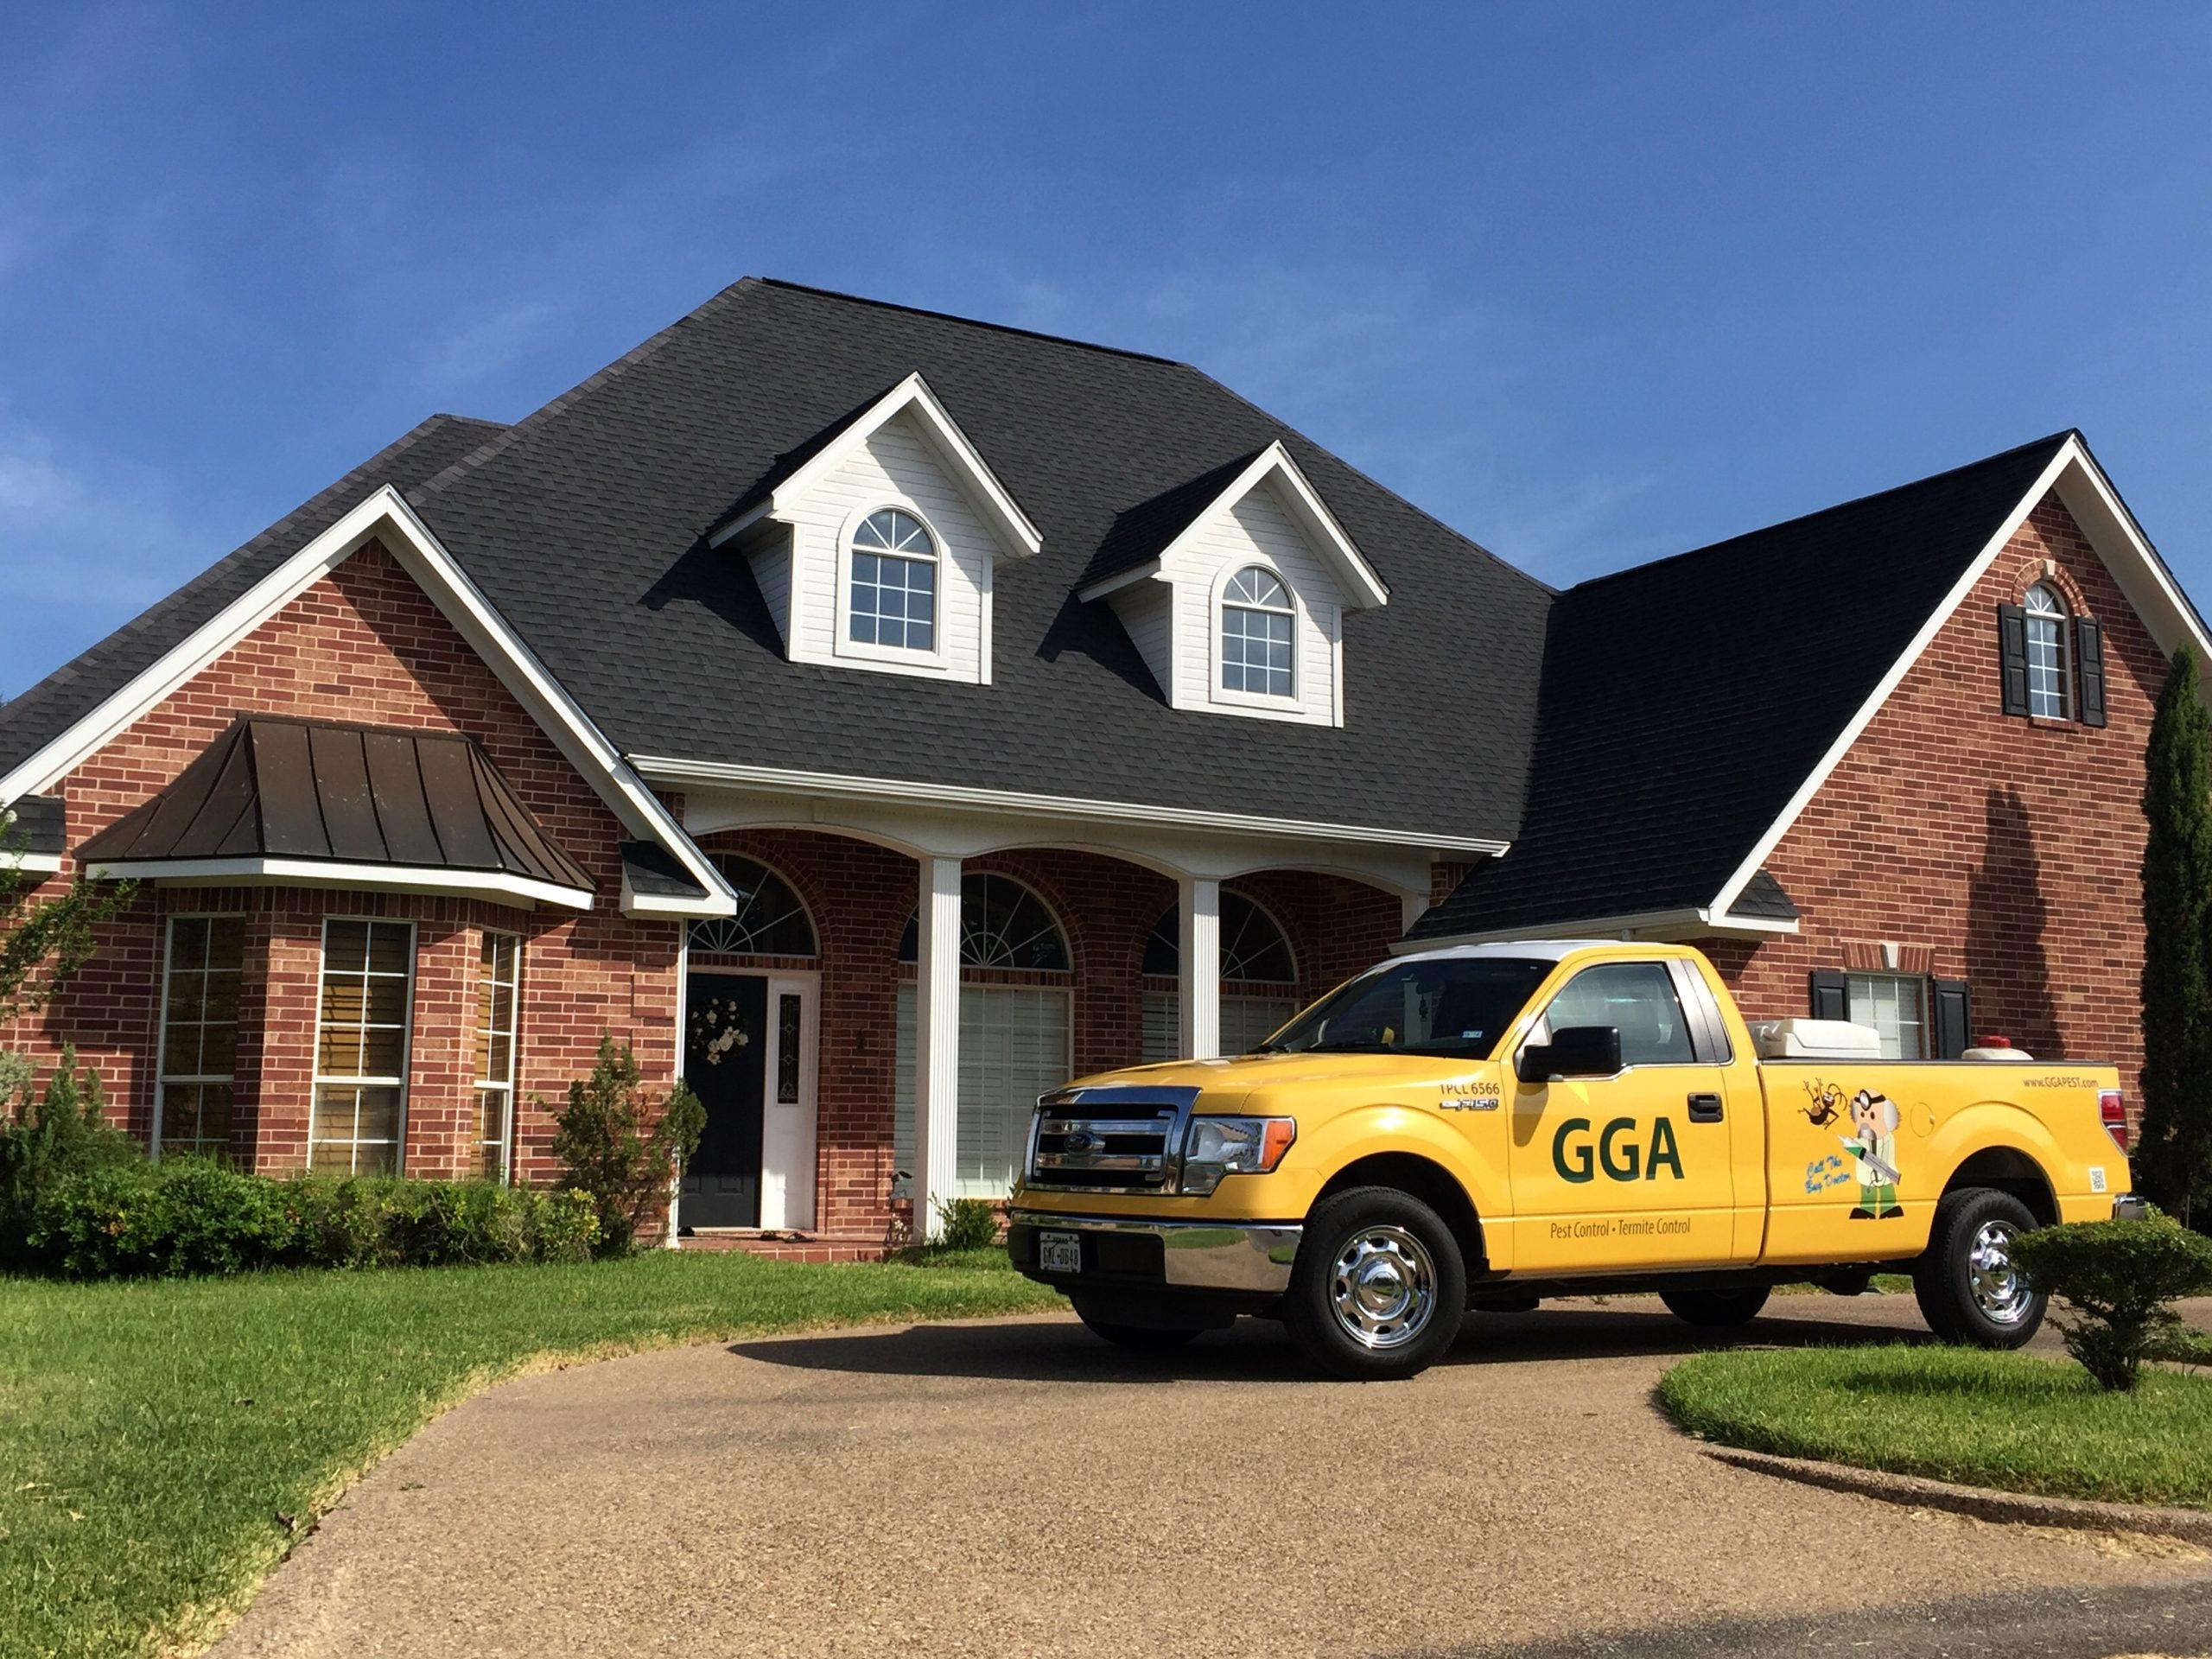 Texas GGA pest control management Vehicle home service